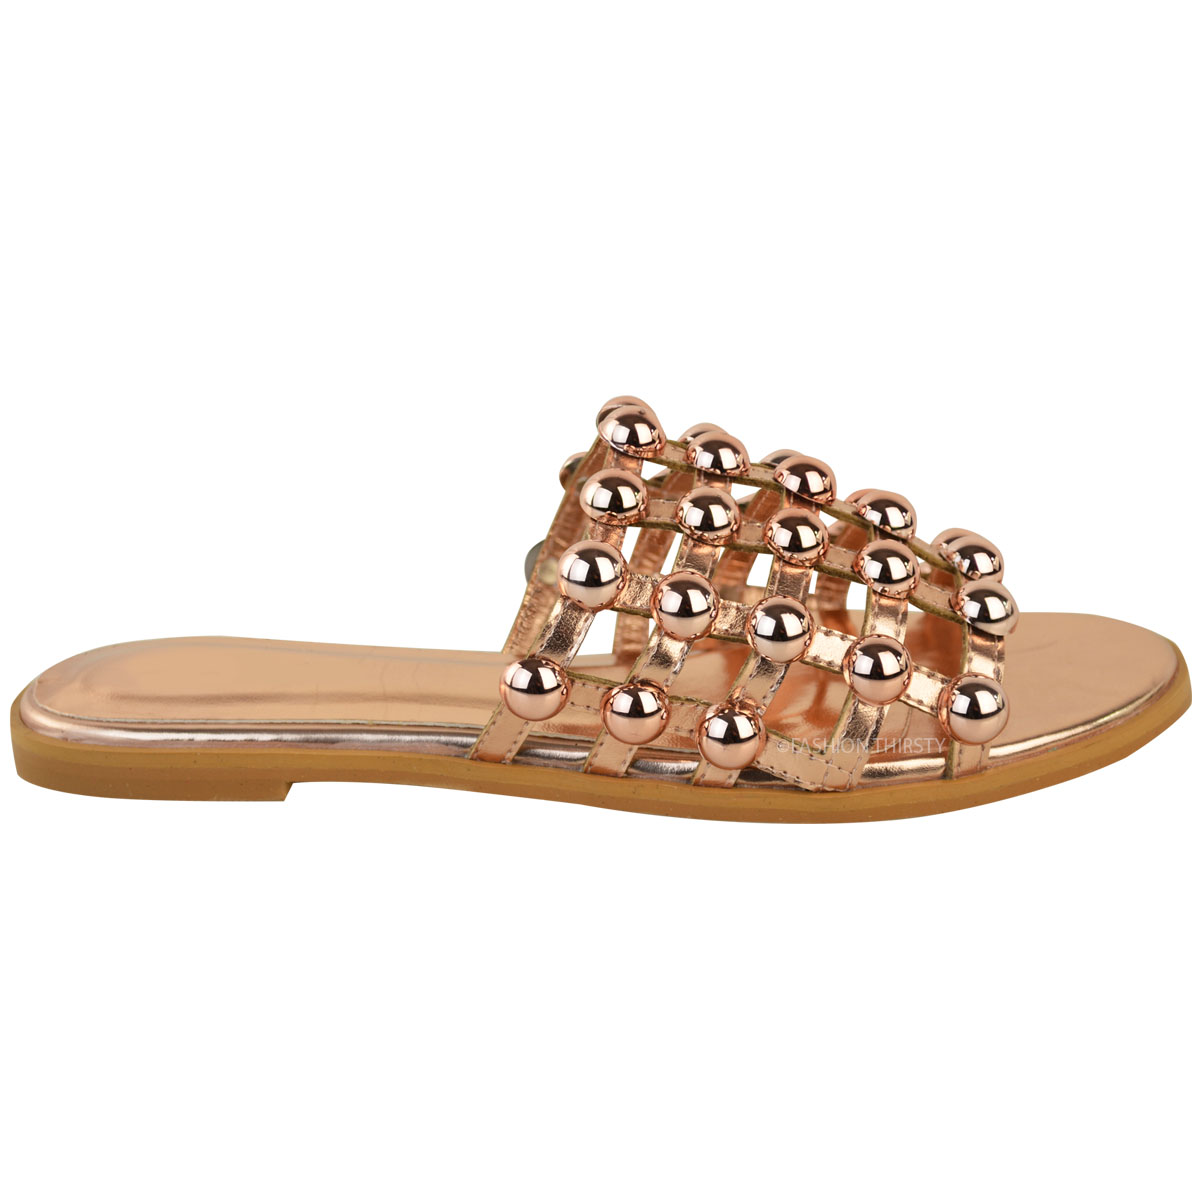 Women Ladies Studded Flat Sandals Bling Diamante Cage Slide Summer Sliders Shoes